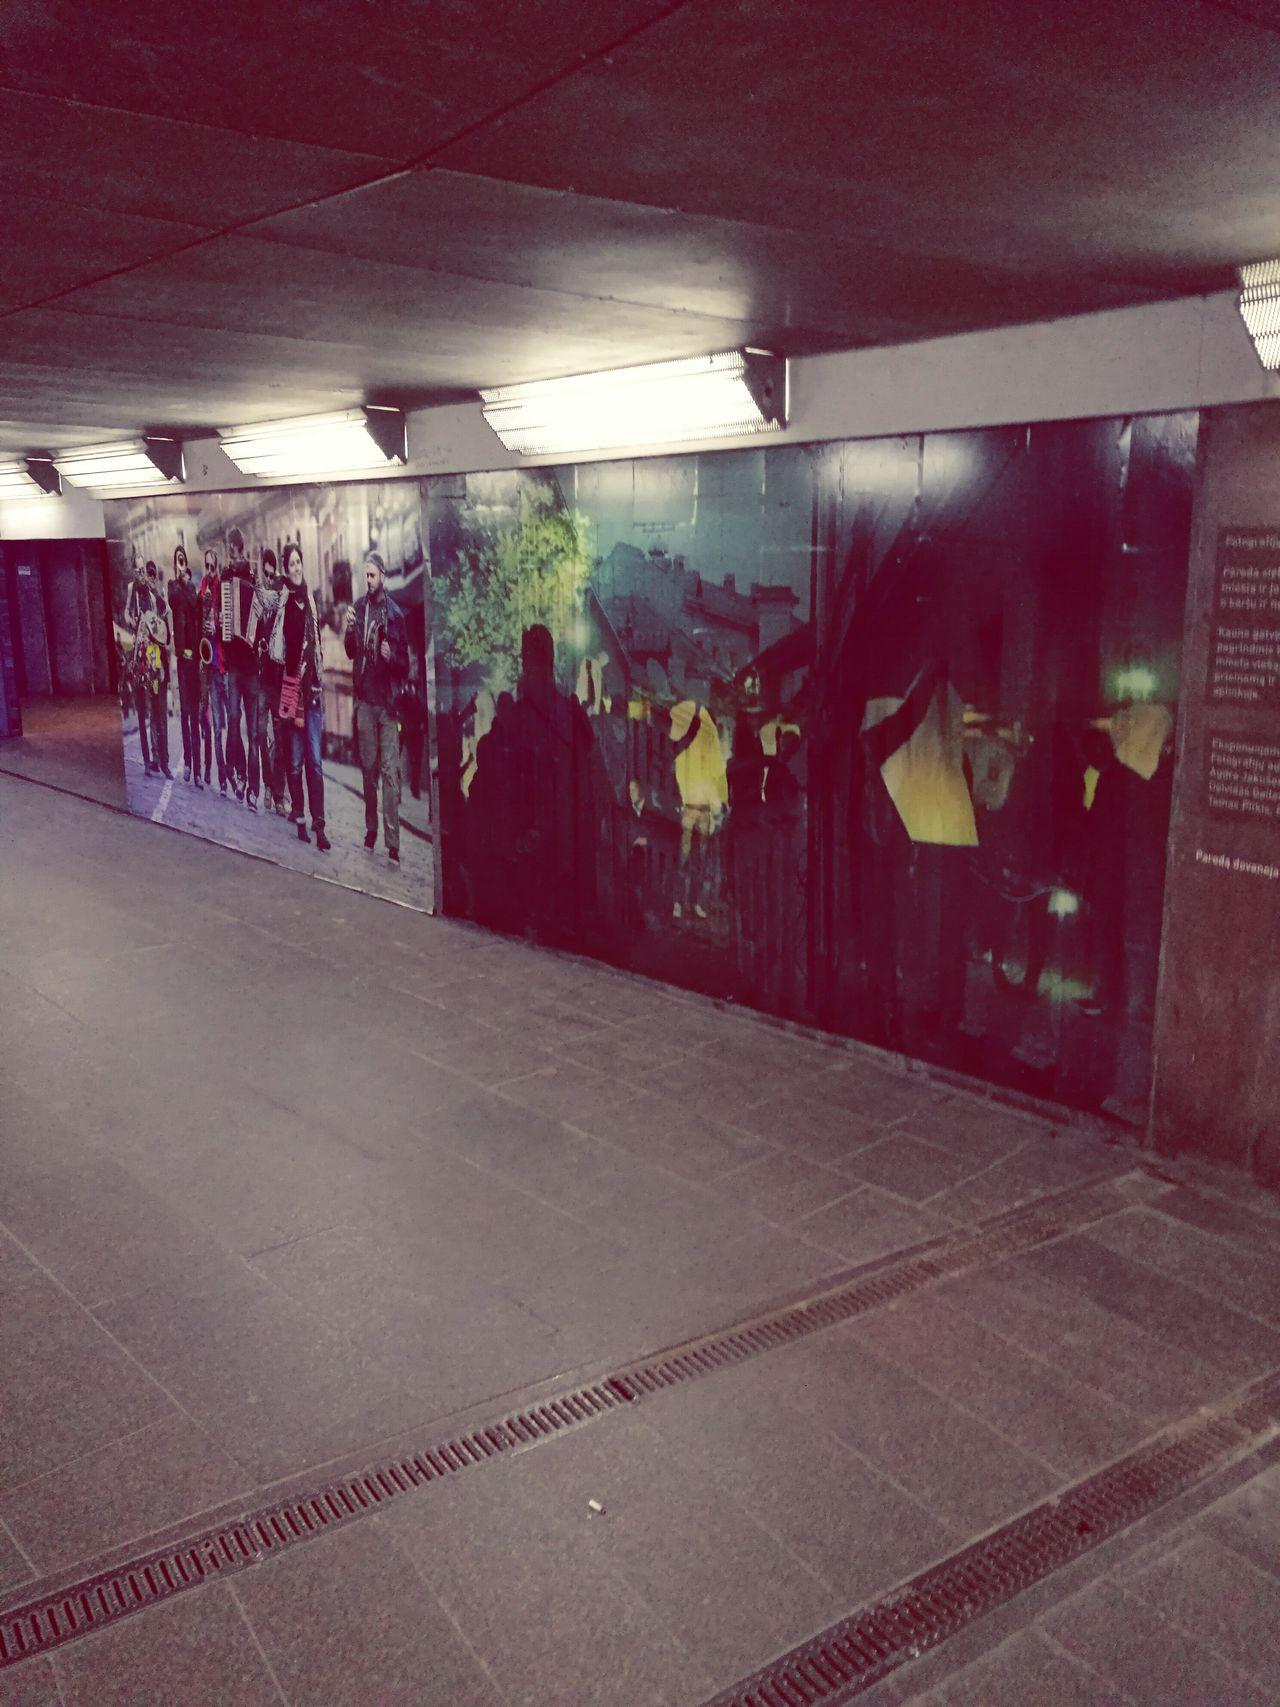 Nightlife Kaunas City Lithuania Undergroundpassage Underground Passage The Street Photographer - 2017 EyeEm Awards